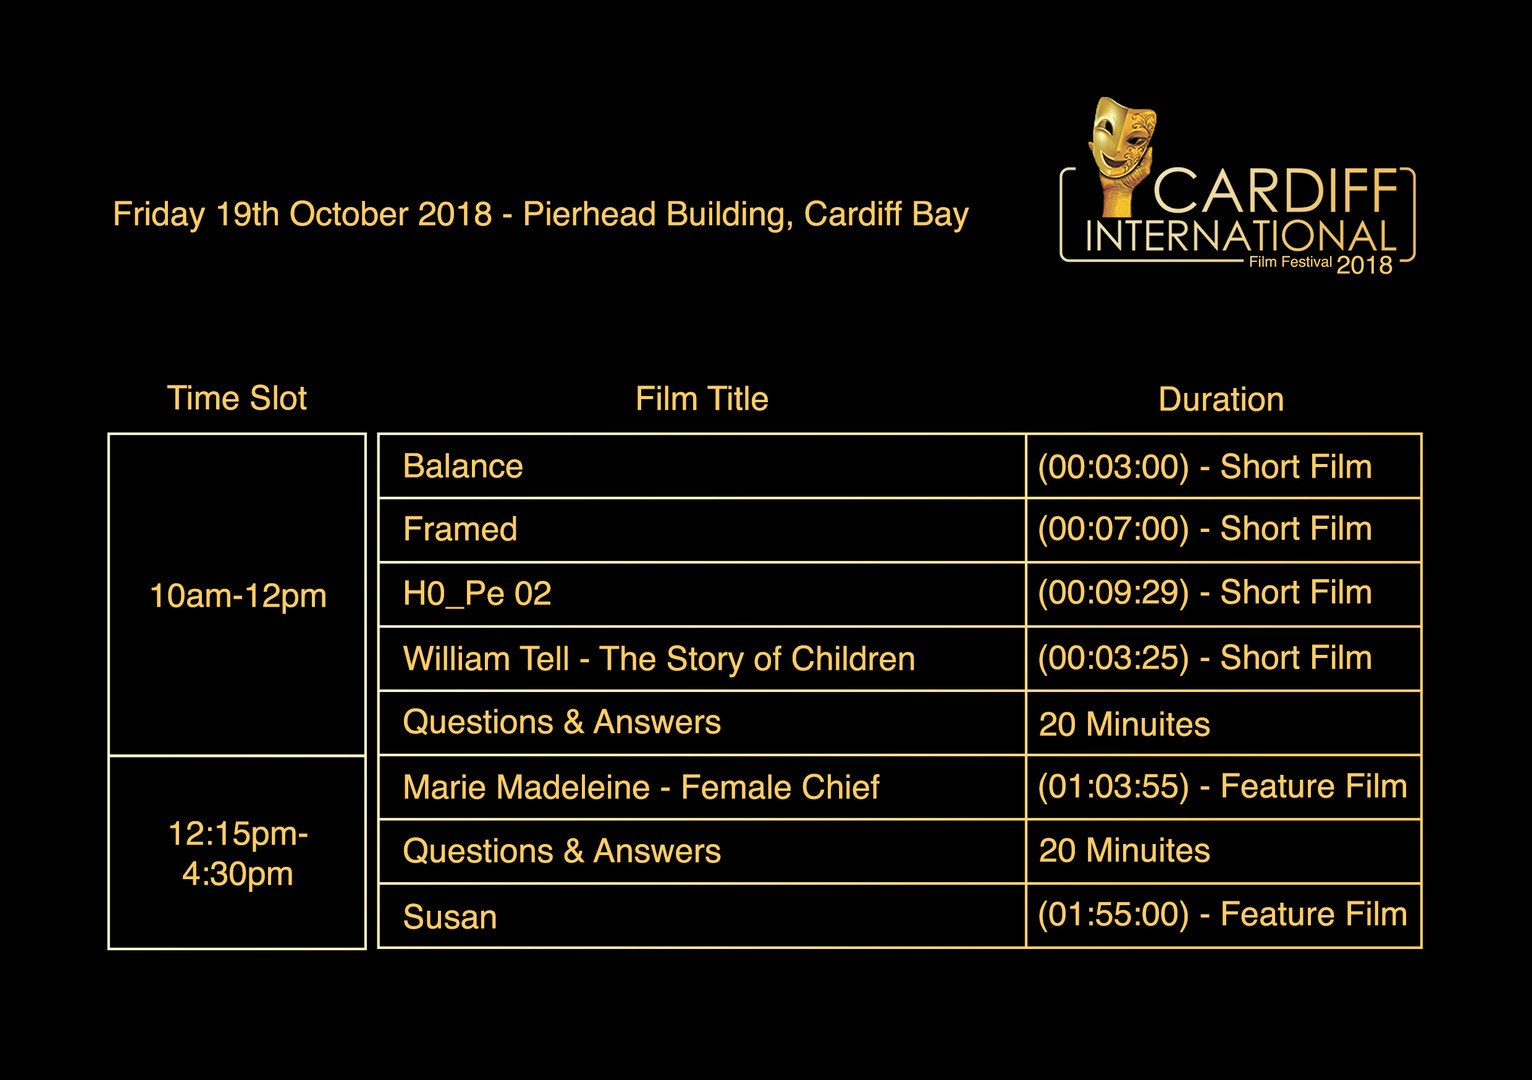 Friday19th October - Pierhead Building